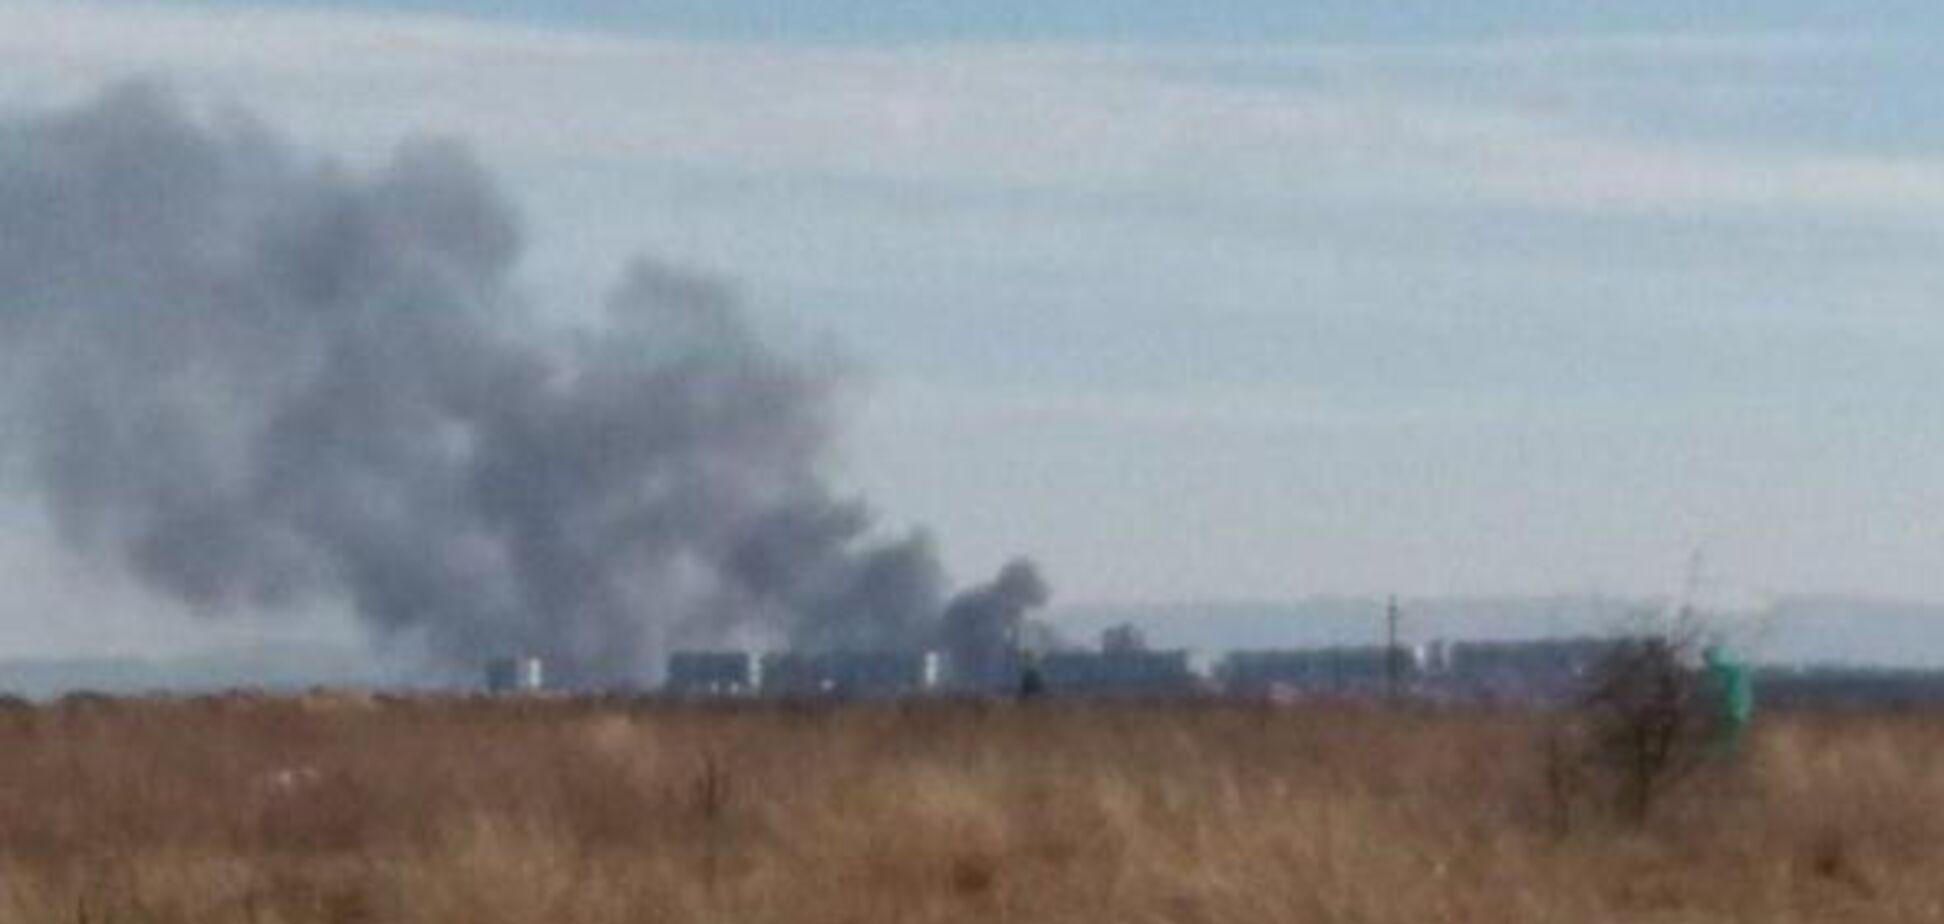 У Криму спалахнула масштабна пожежа на заводі: перші подробиці